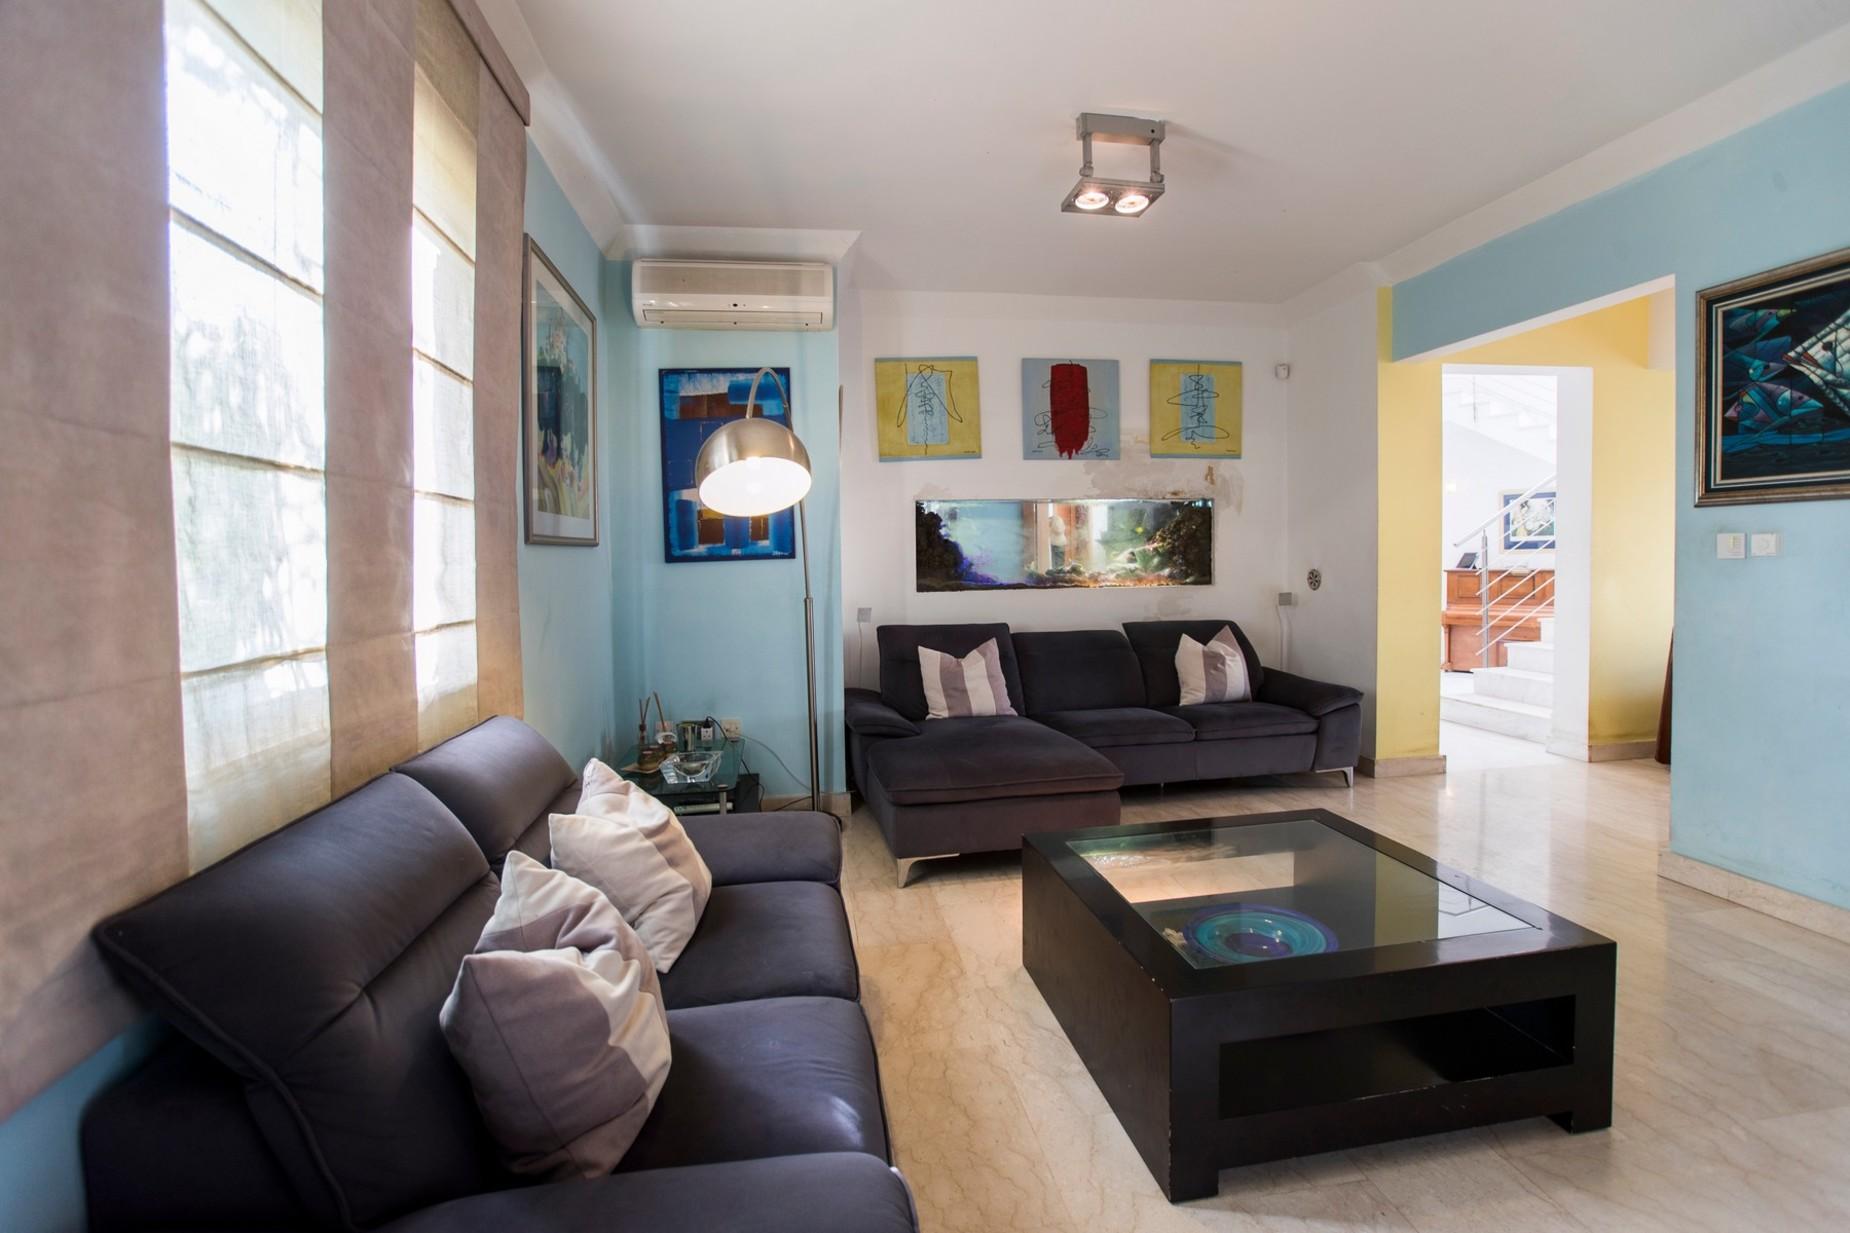 4 bed Villa For Rent in Naxxar, Naxxar - thumb 9